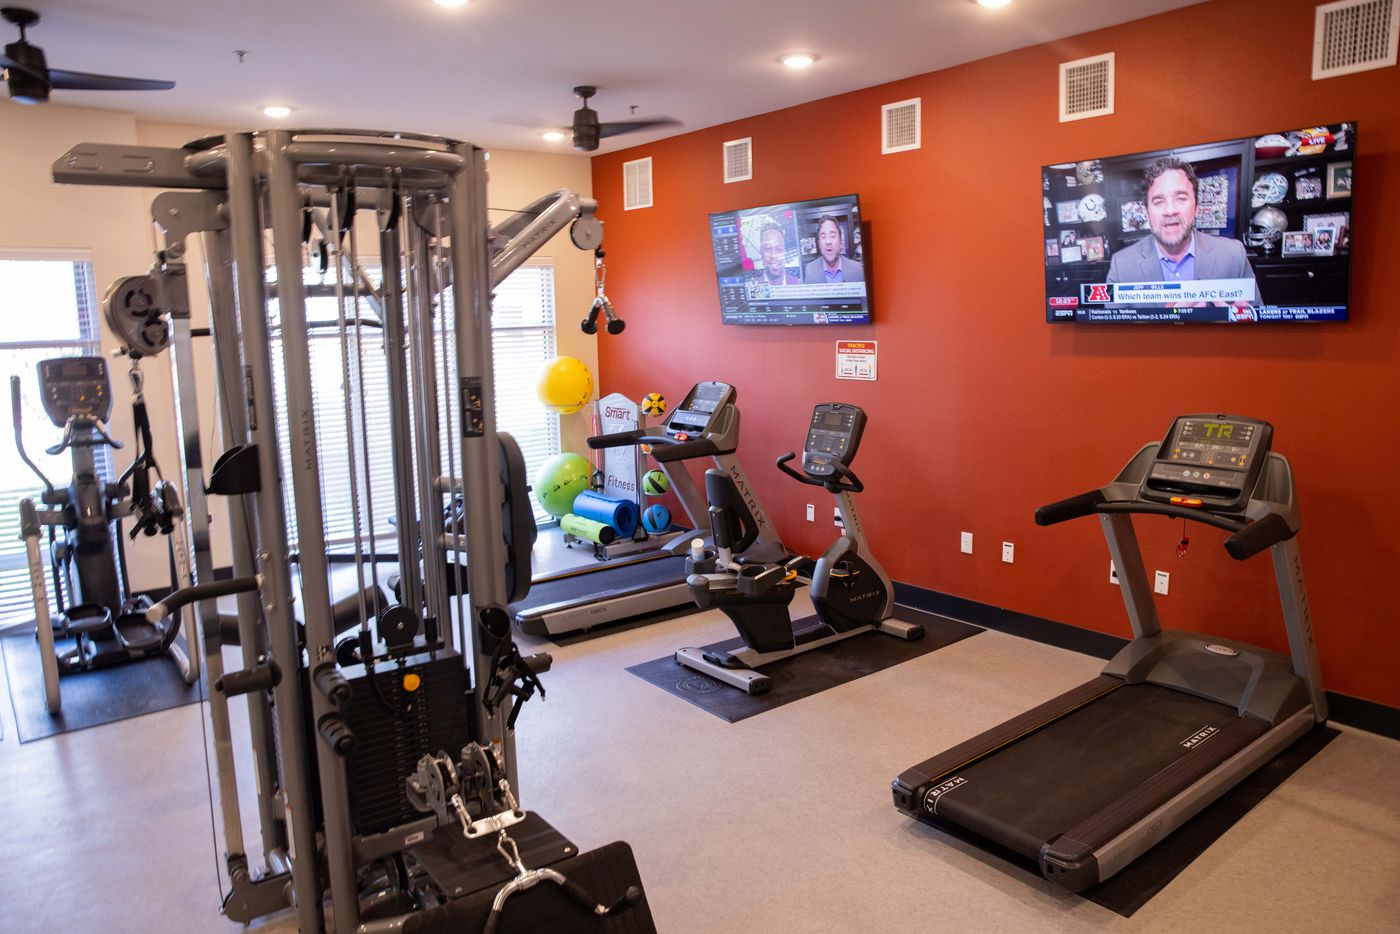 The fitness center at Palladium RedBird apartments.